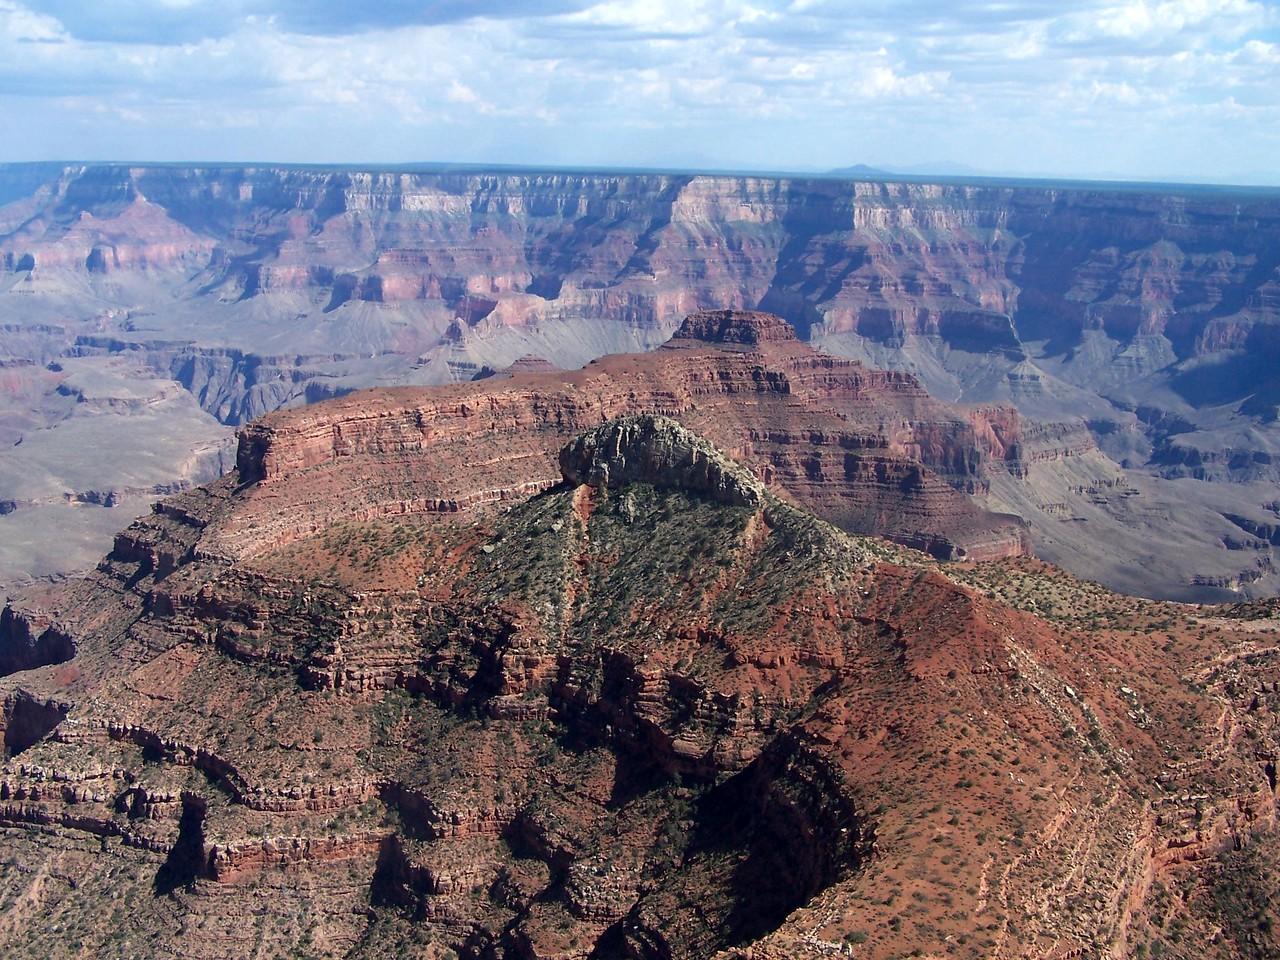 AZ-2007-0728-6867